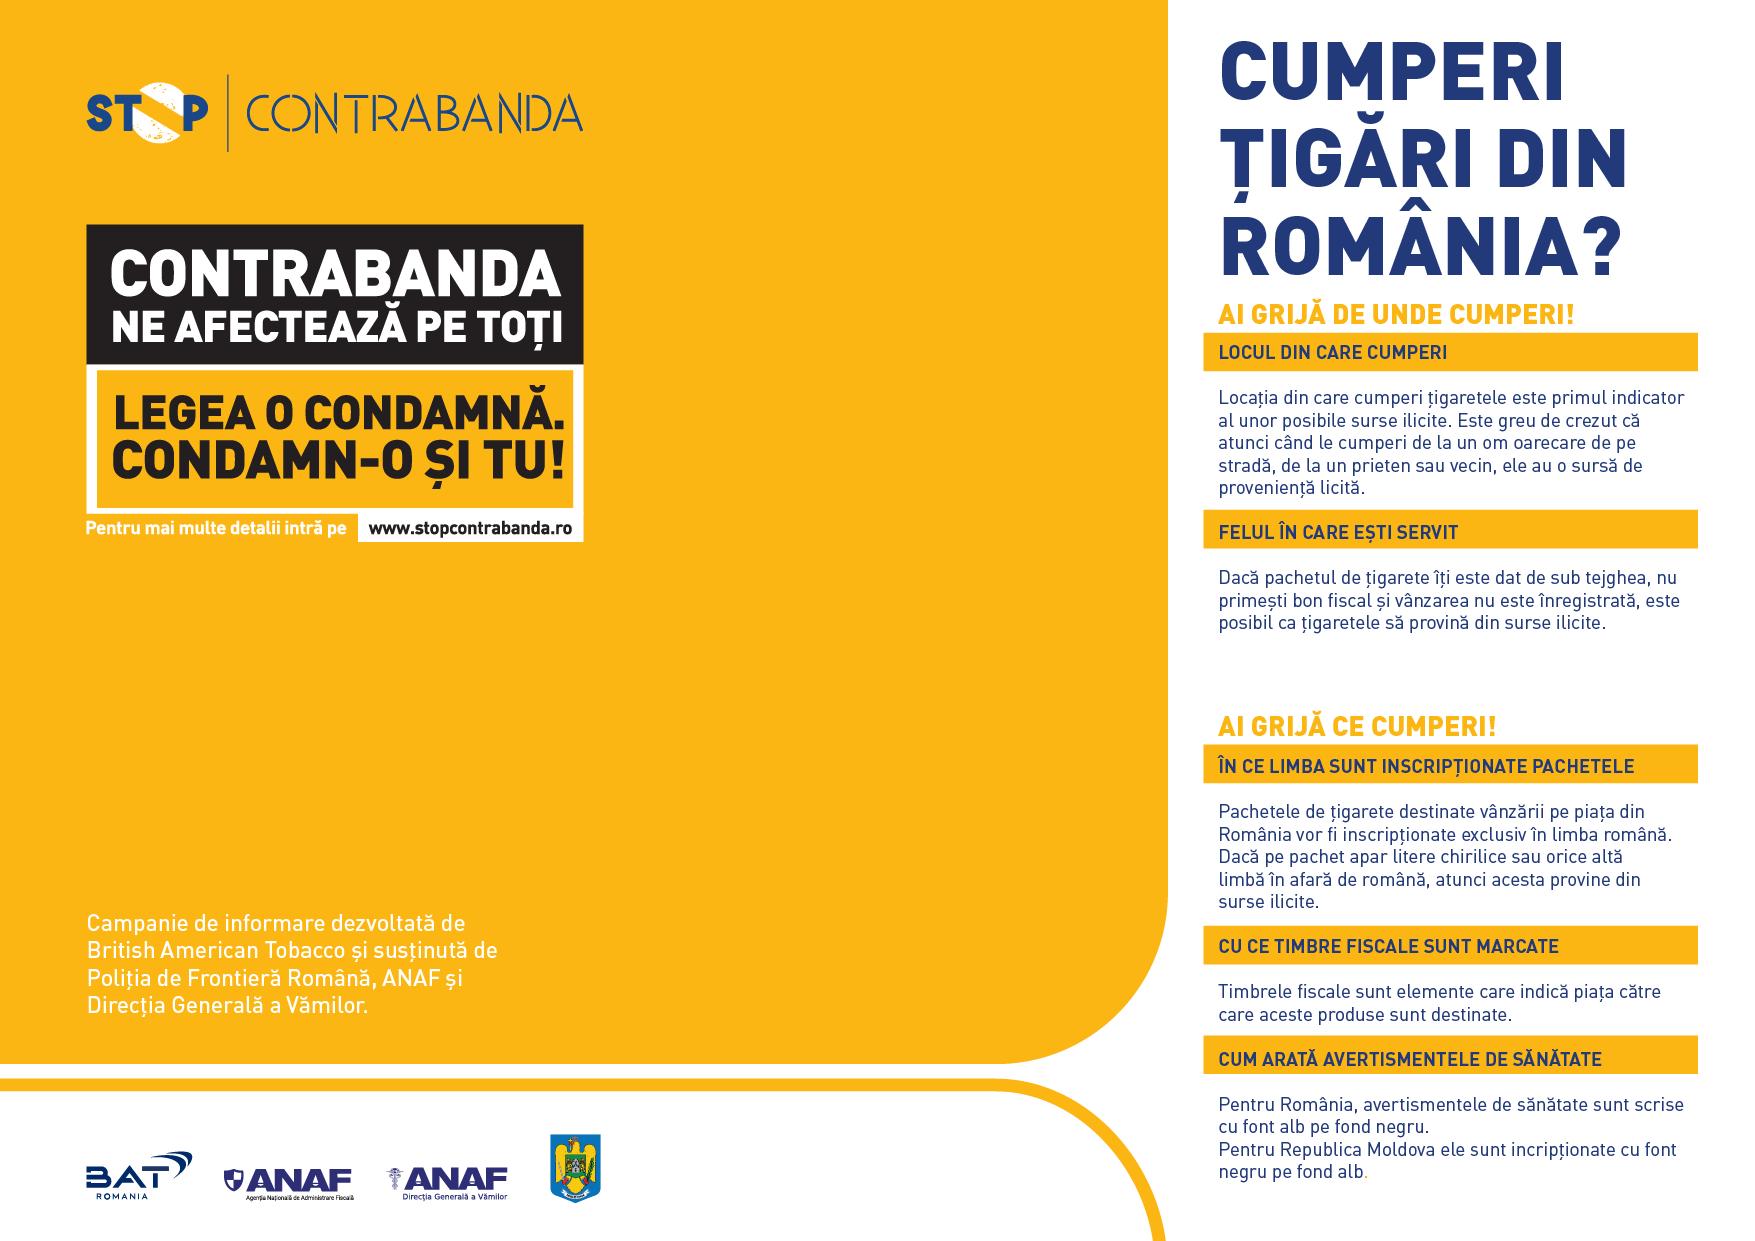 STOP CONTRABANDA 2